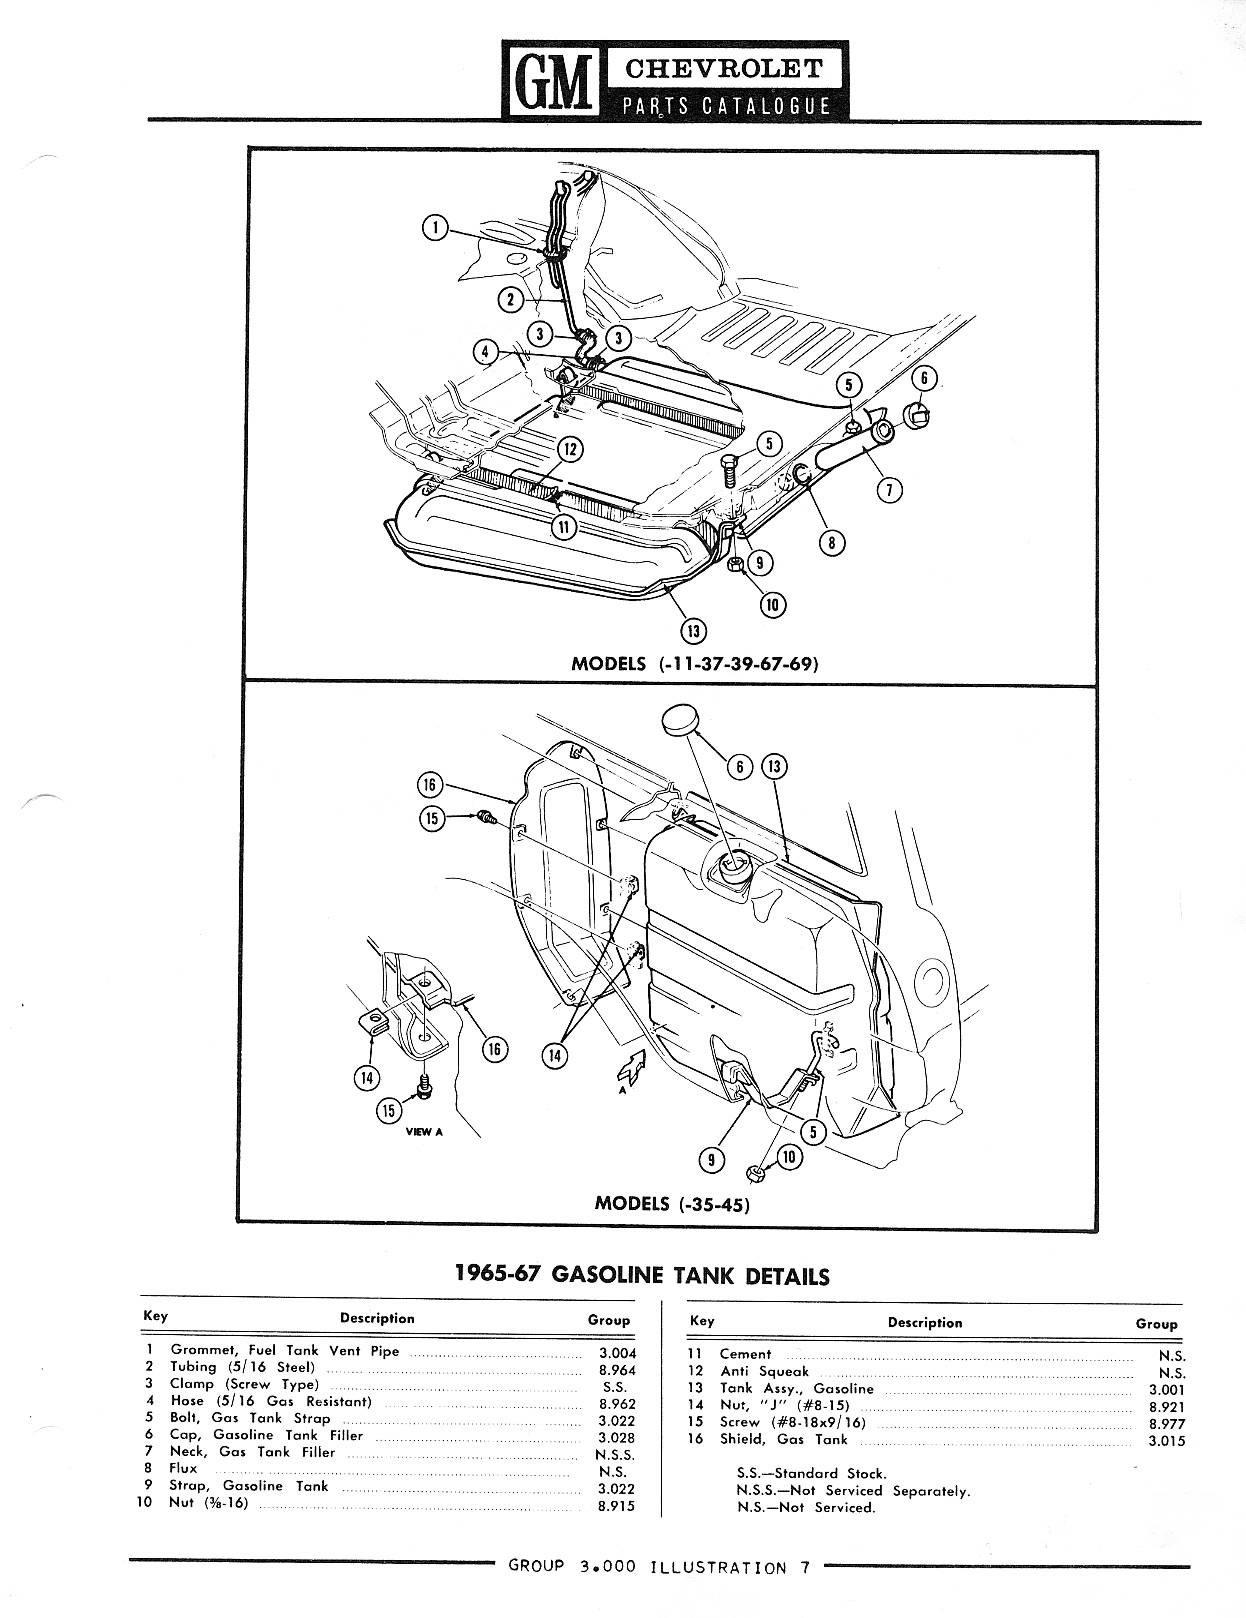 1958-1968 Chevrolet Parts Catalog / Image7.jpg